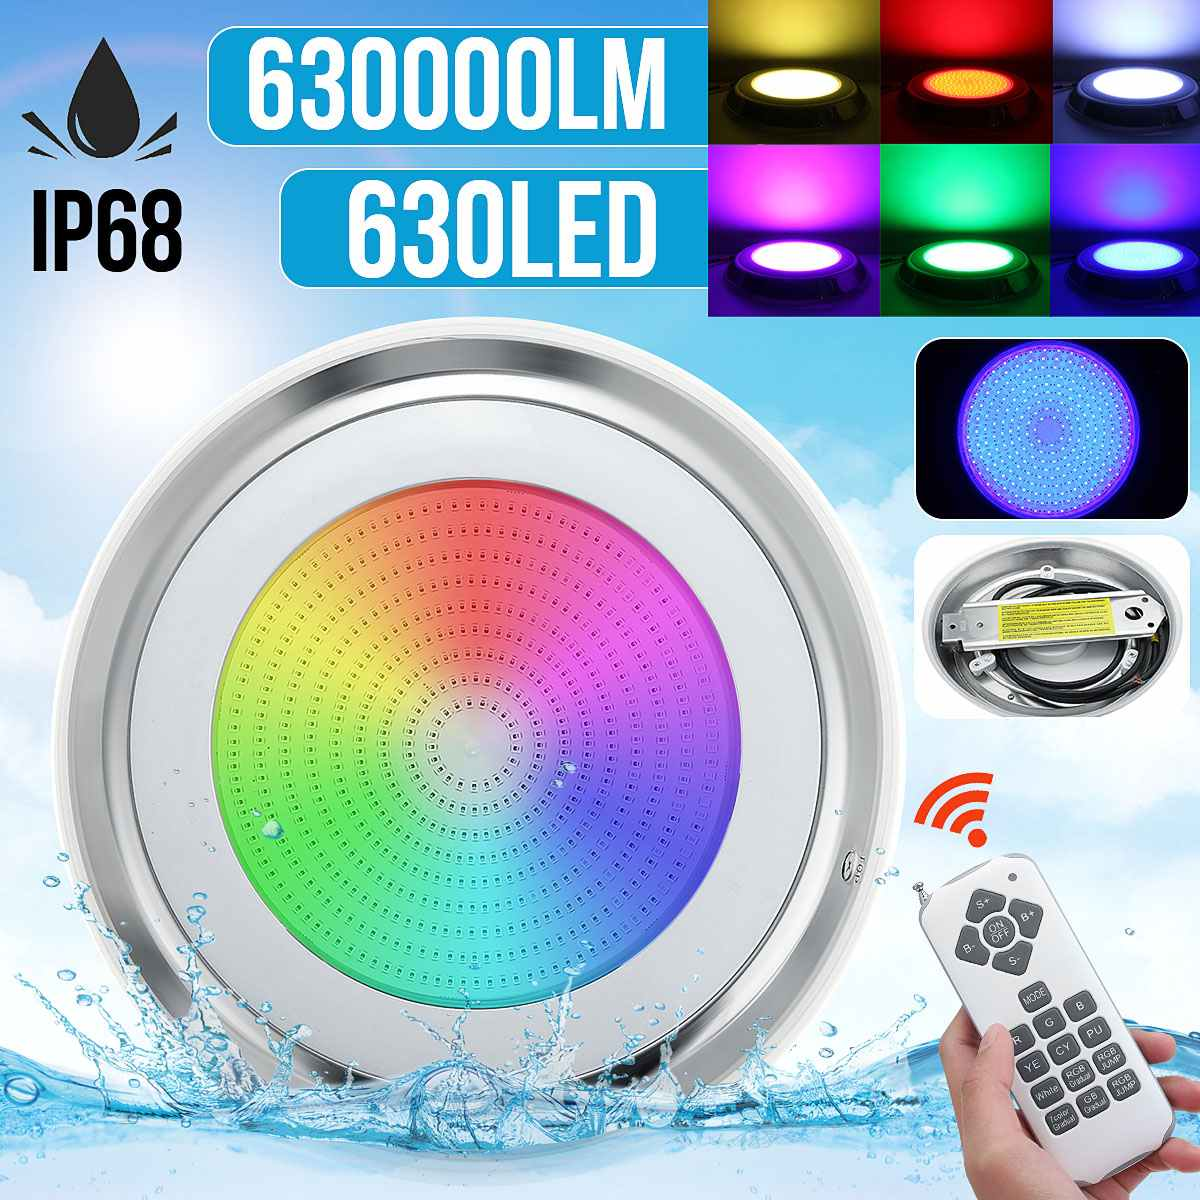 65W RGB Swimming Pool LED Lamp Waterproof IP68 Underwater Spotlight Remote Control Pond Lights DC12V 630SMD Fountain Lighting